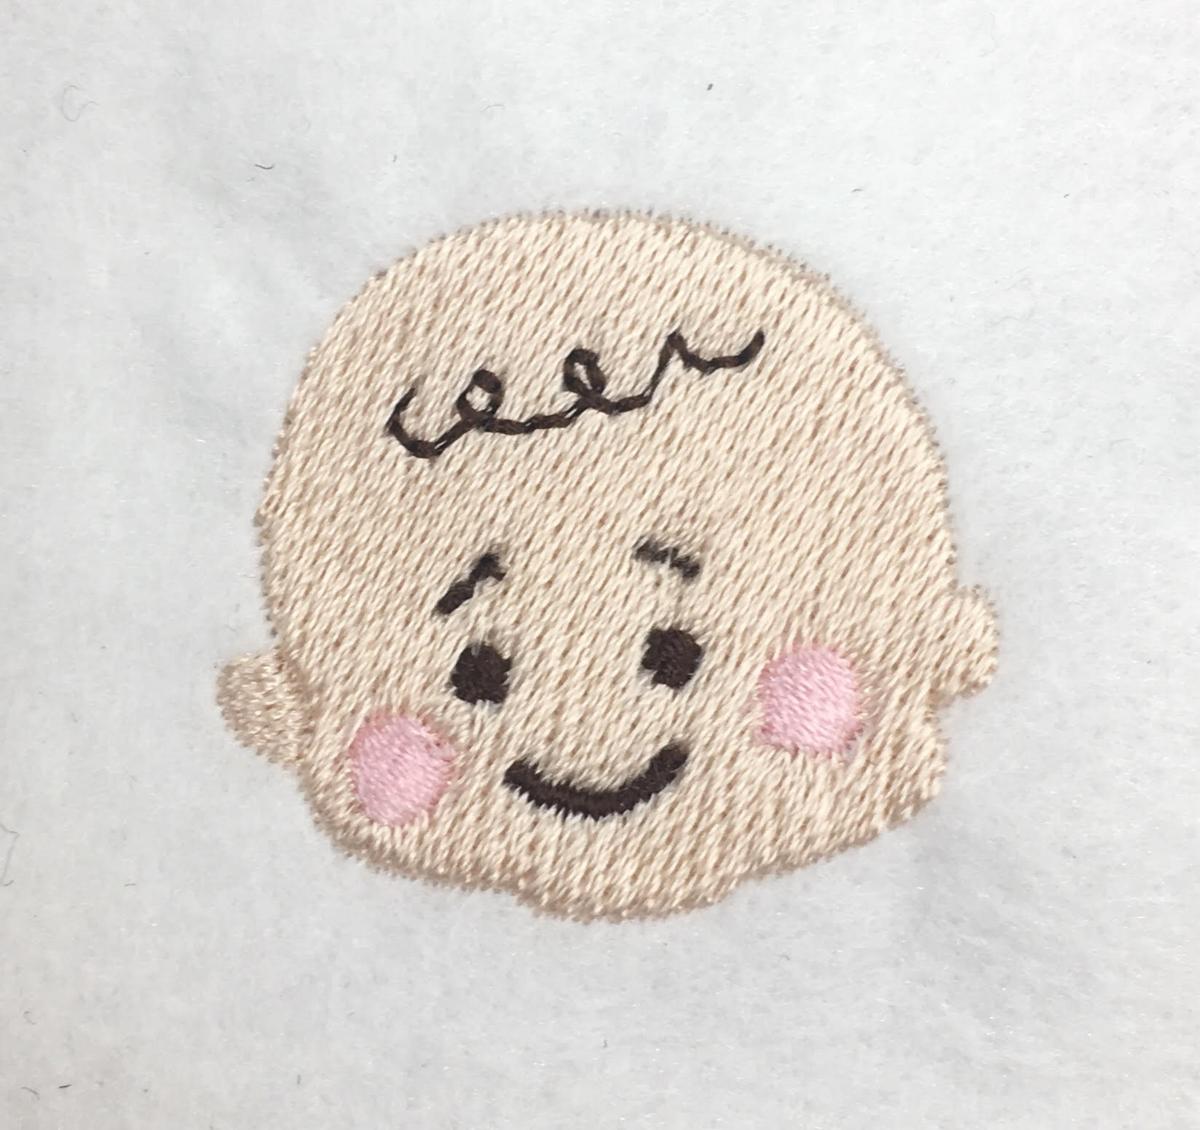 f:id:embroideryplay:20190412165656p:plain